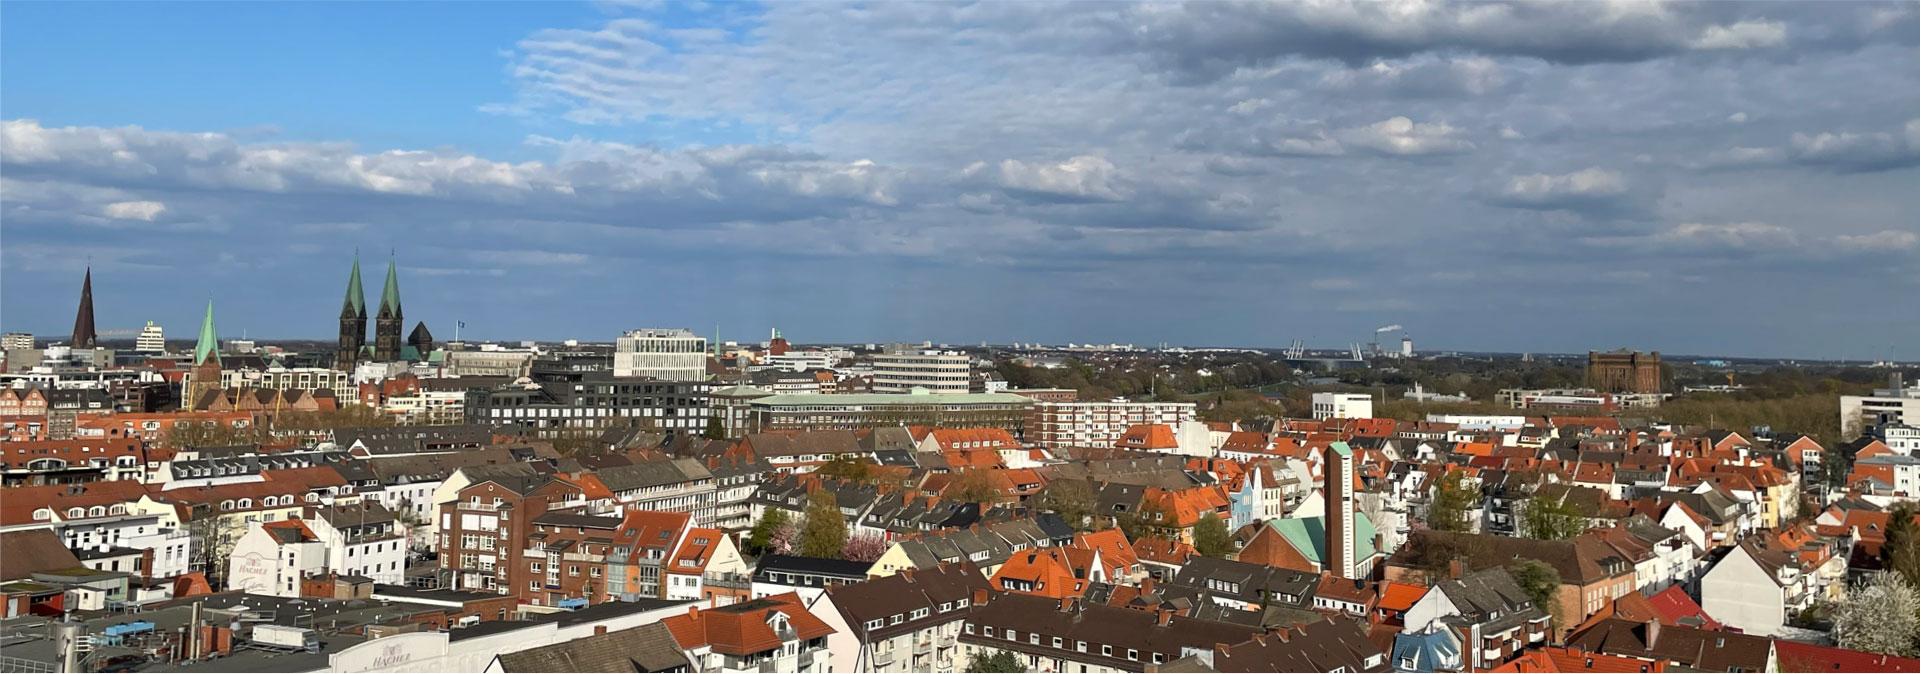 Panoram Bremen